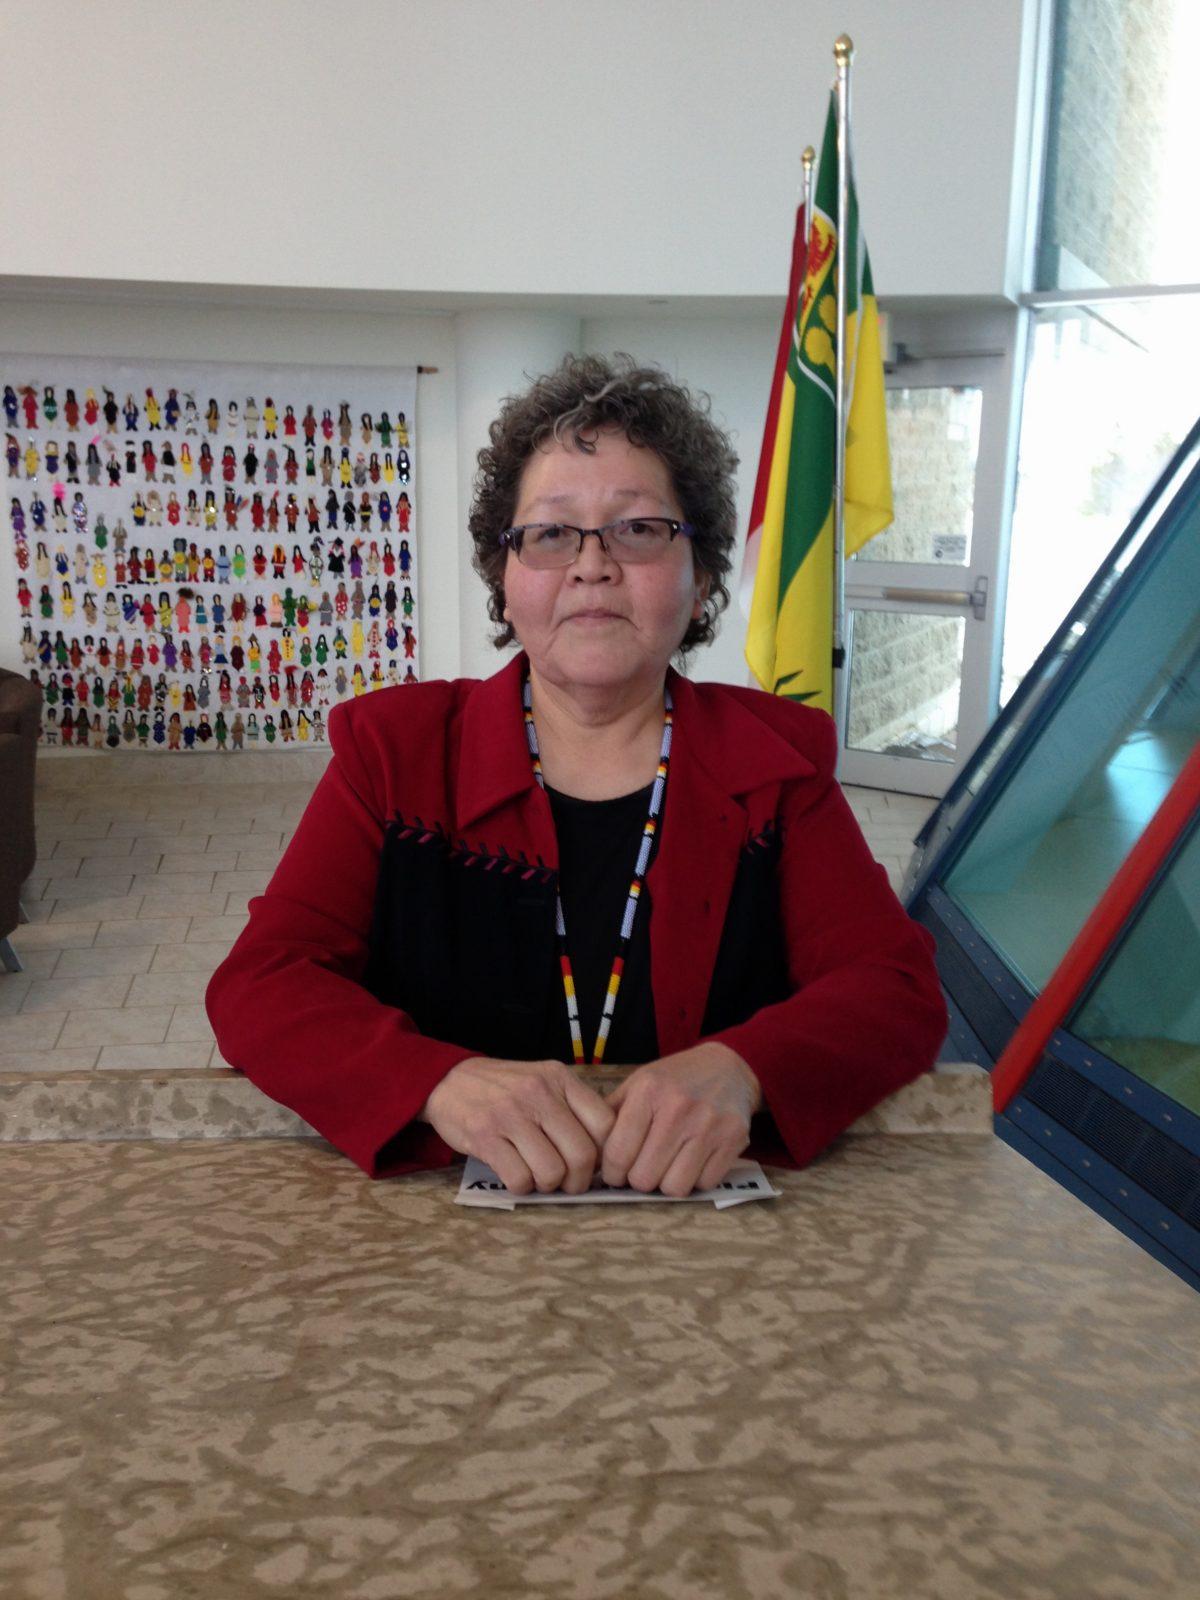 Elders Play a Vital Role at FNUniv and across Saskatchewan